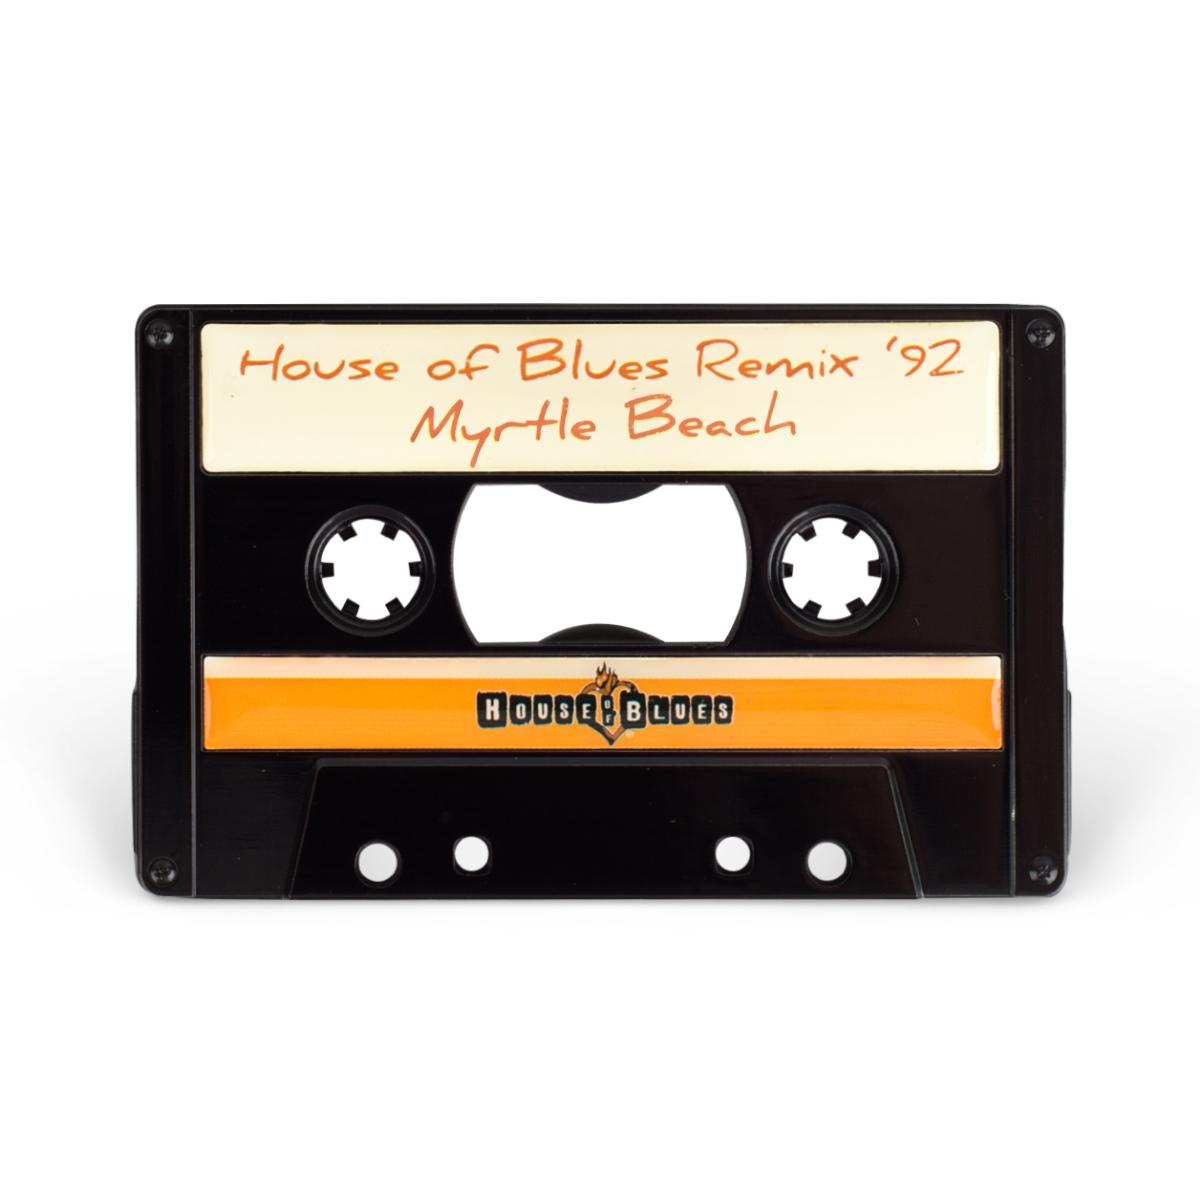 Cassette Opener Magnet – Myrtle Beach